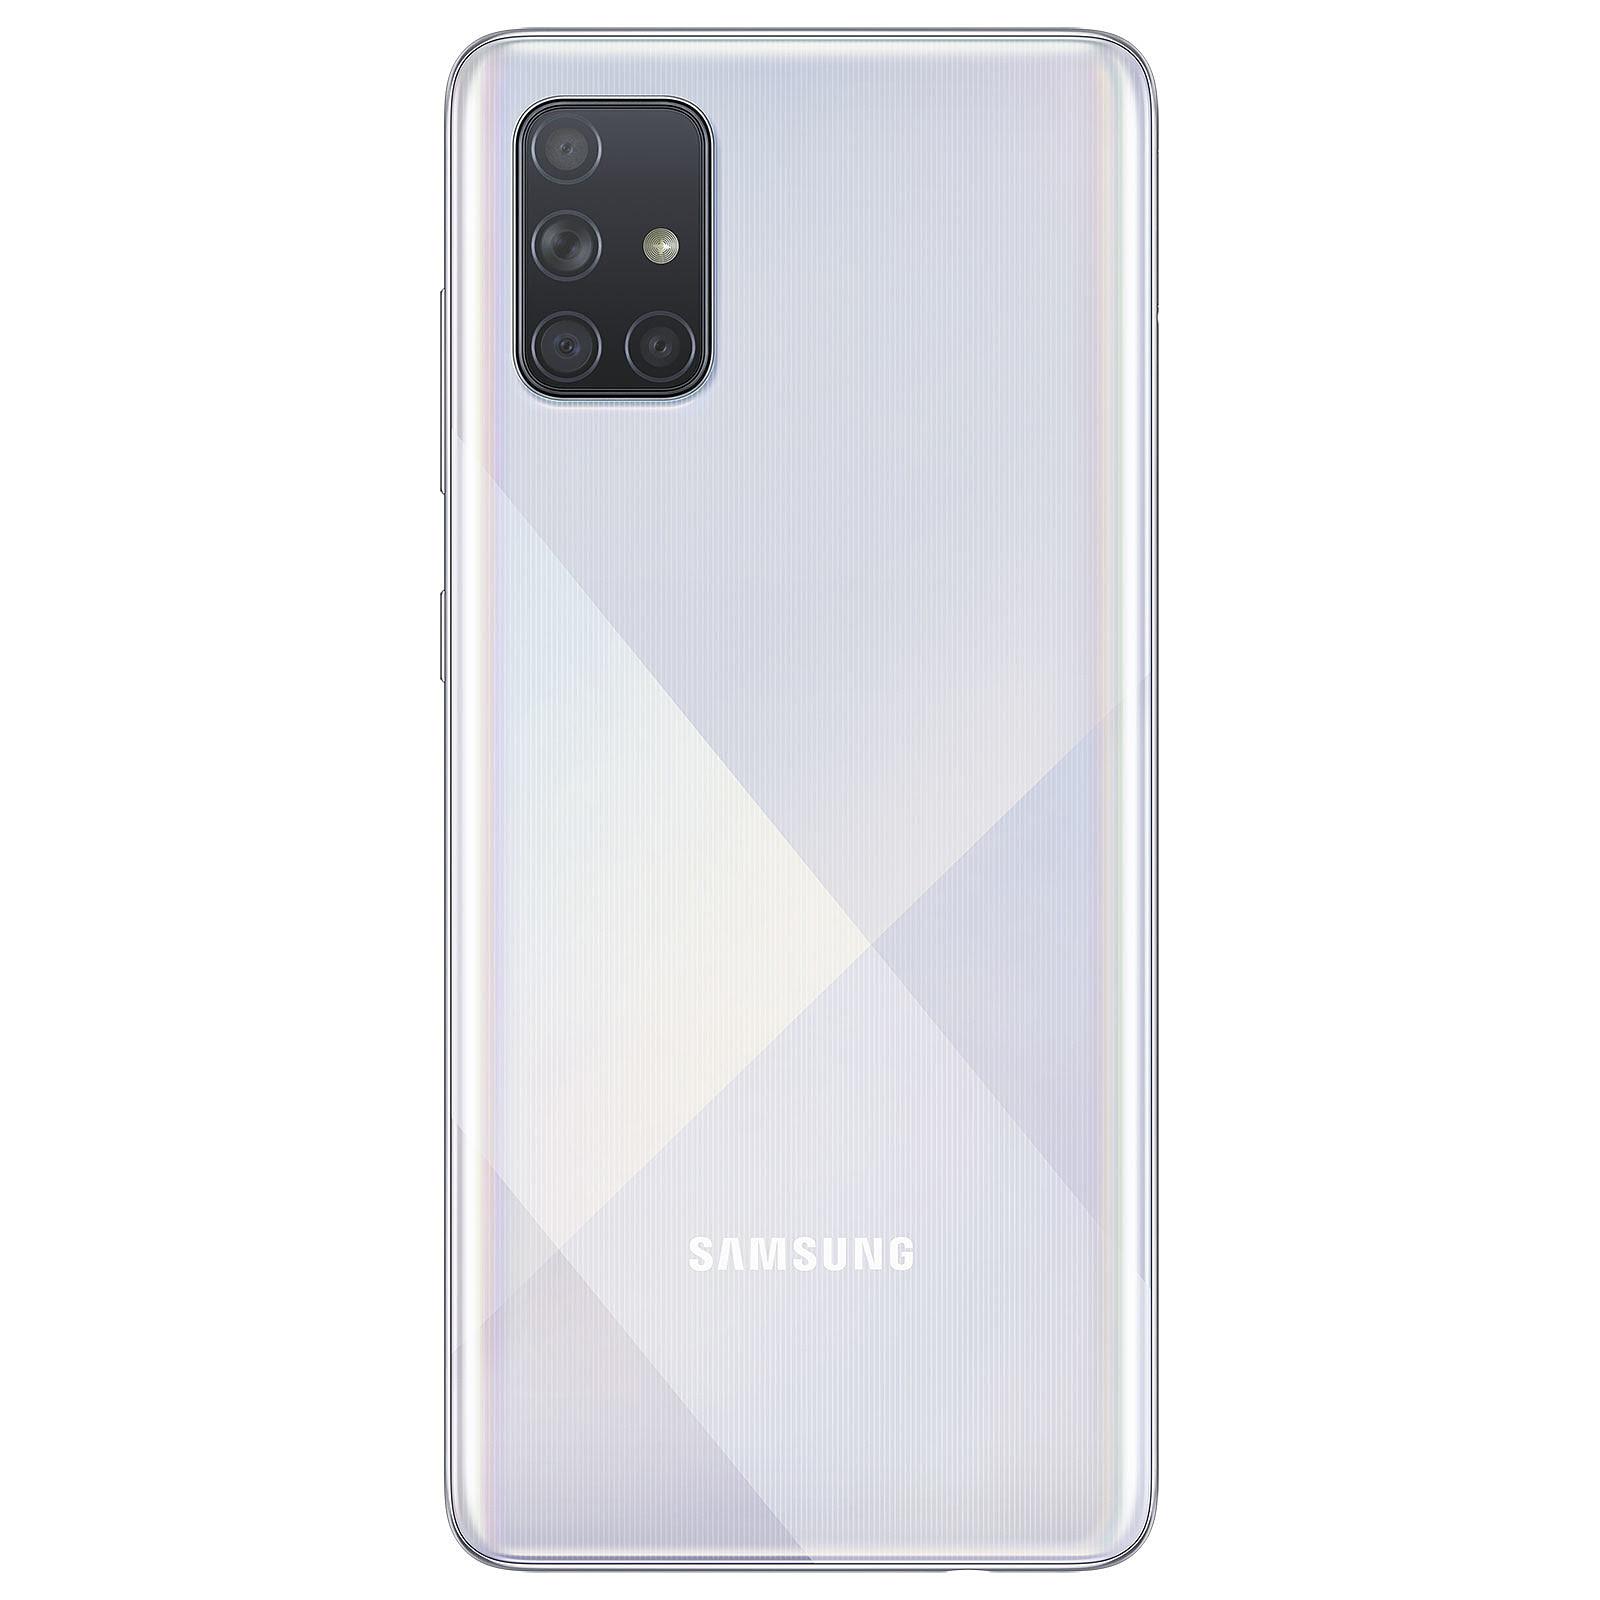 Samsung Galaxy A71 128Go Silver - Téléphonie Samsung - Cybertek.fr - 1